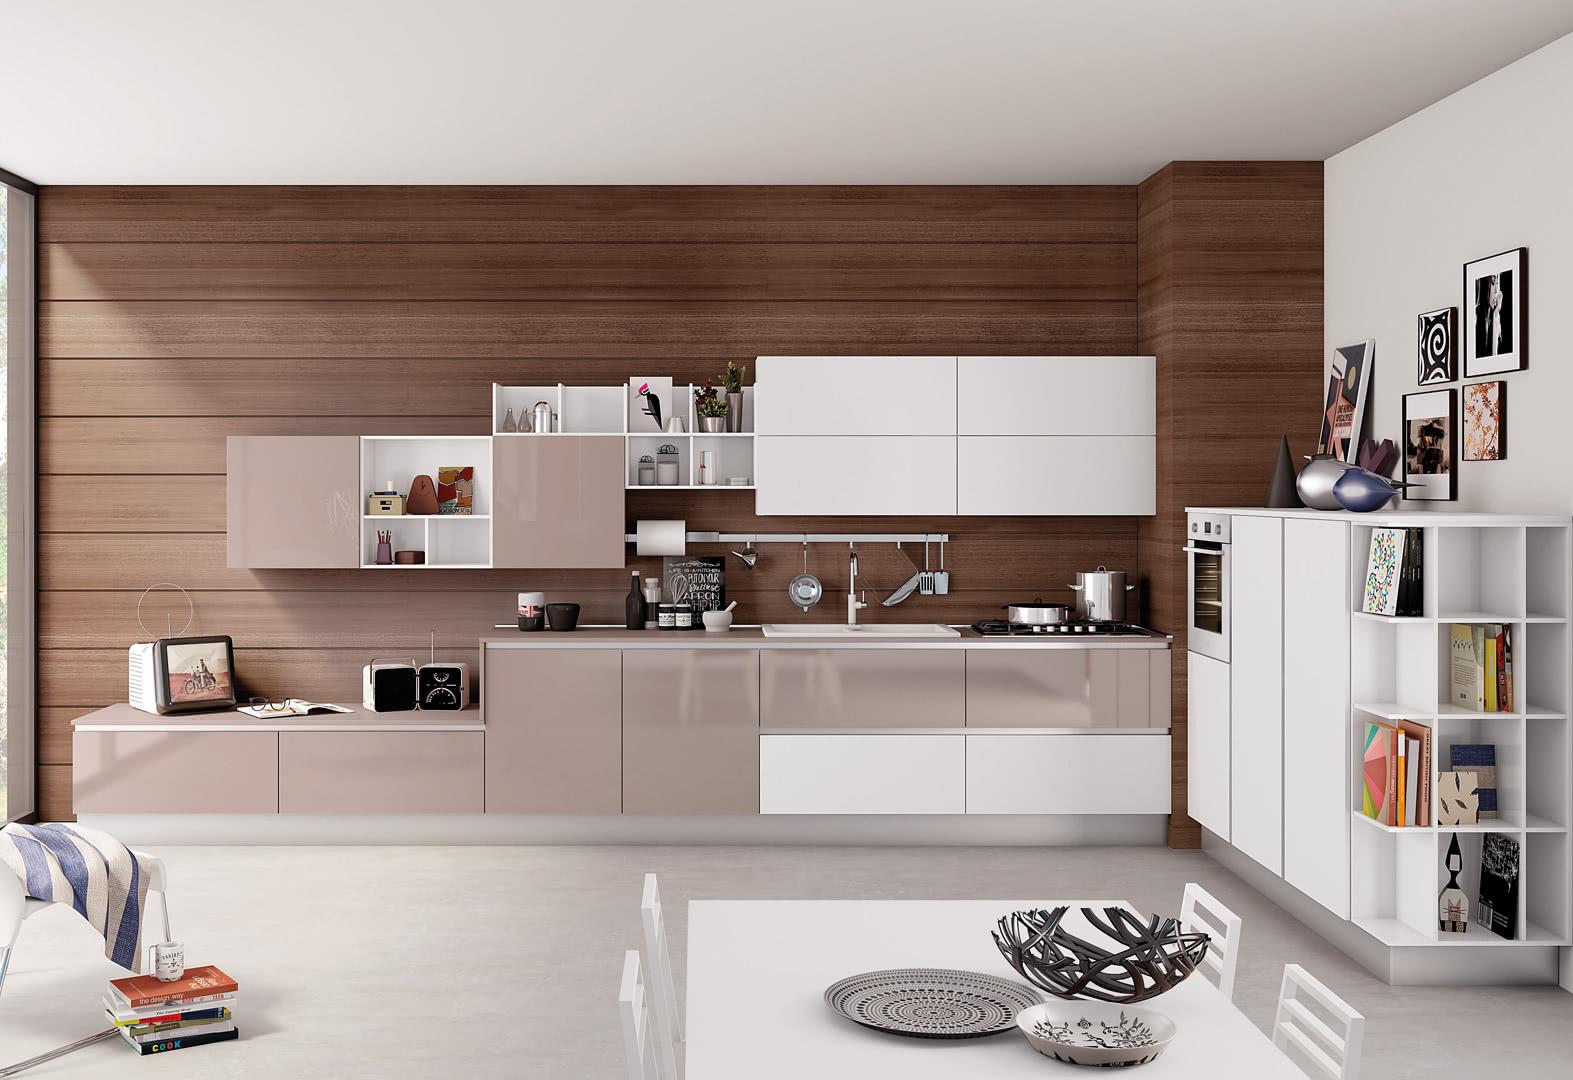 Focus tecnici - Creo Cucine - Creo Kitchens